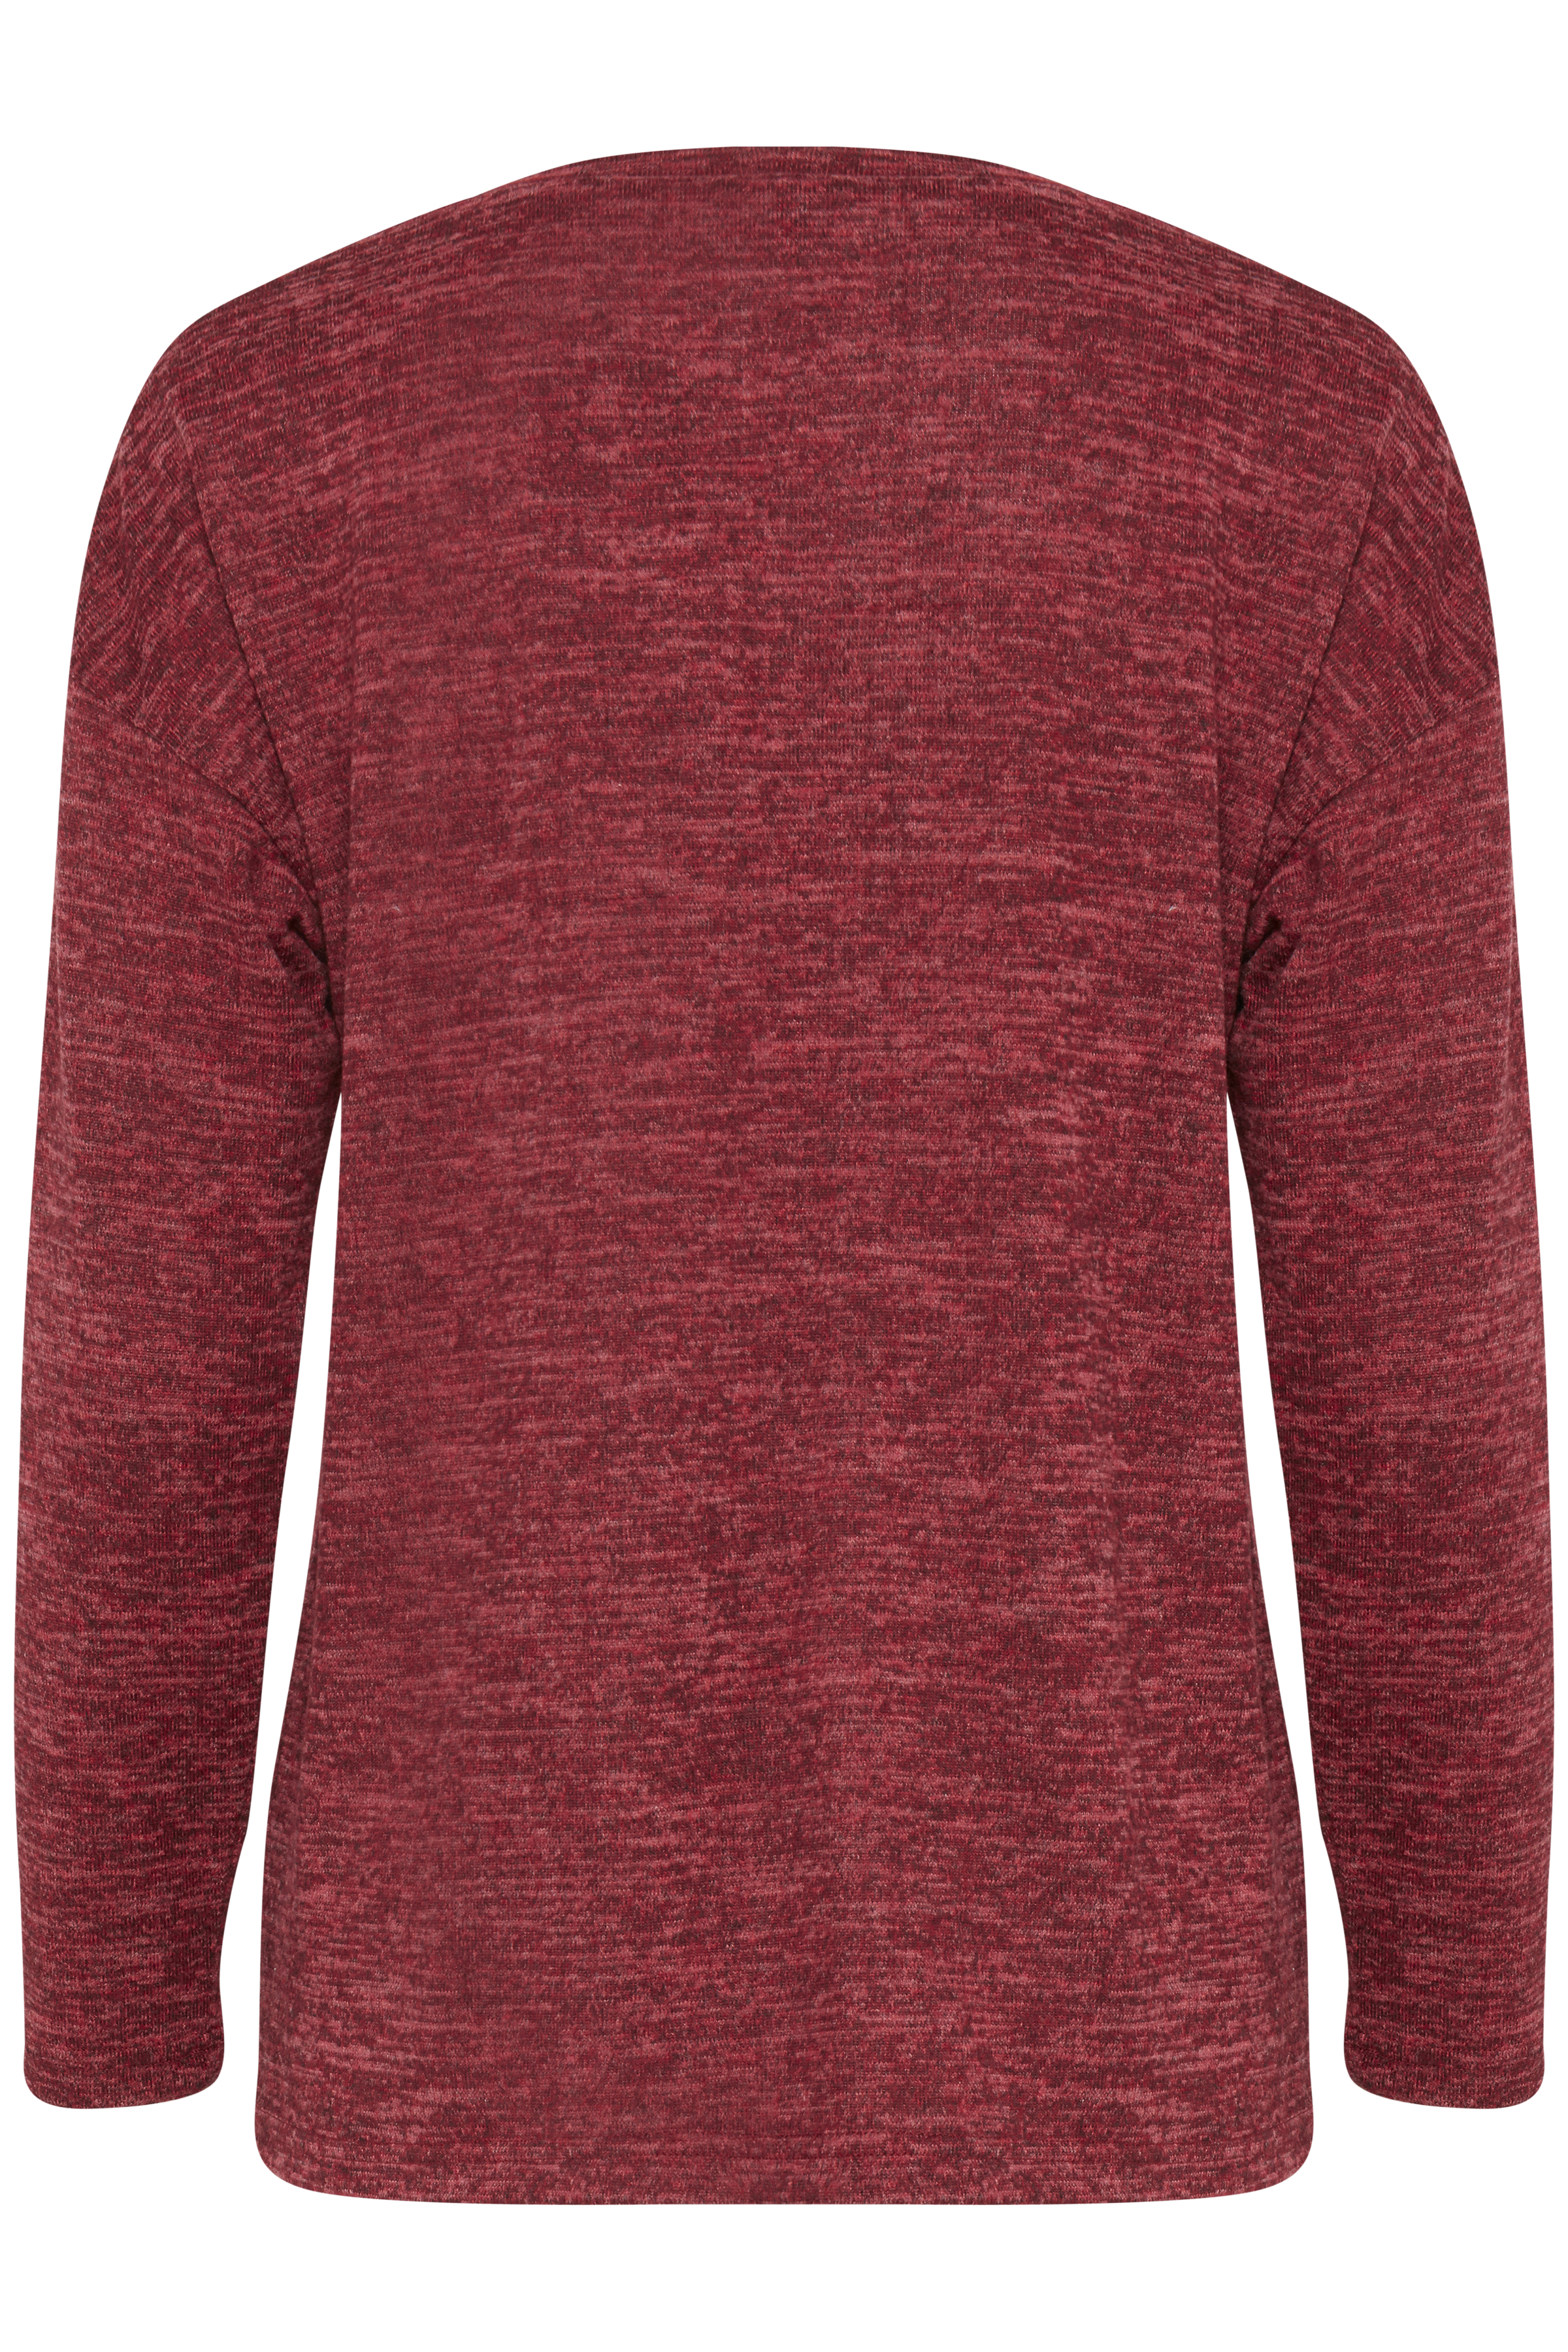 Blood Red melange Langermet bluse fra b.young - Kjøp Blood Red melange Langermet bluse fra størrelse XS-XXL her